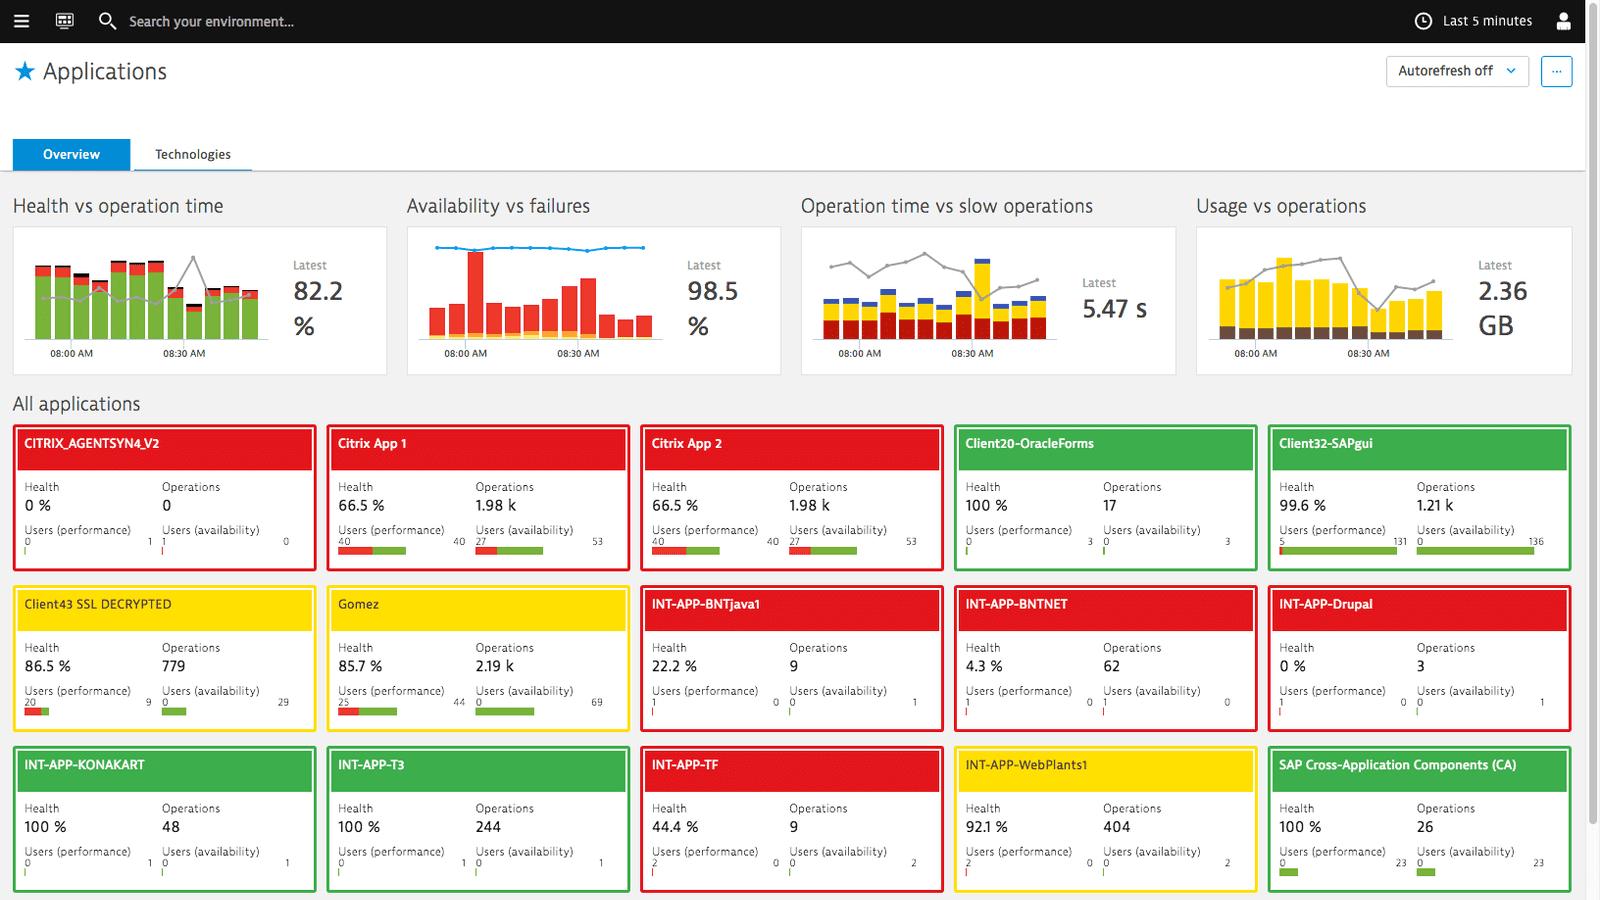 Dynatrace 能让您在单一屏幕上直观地了解您所有企业应用的性能和可用性,与真实用户所感受到的完全一致。您可以立即聚焦问题并评估影响。